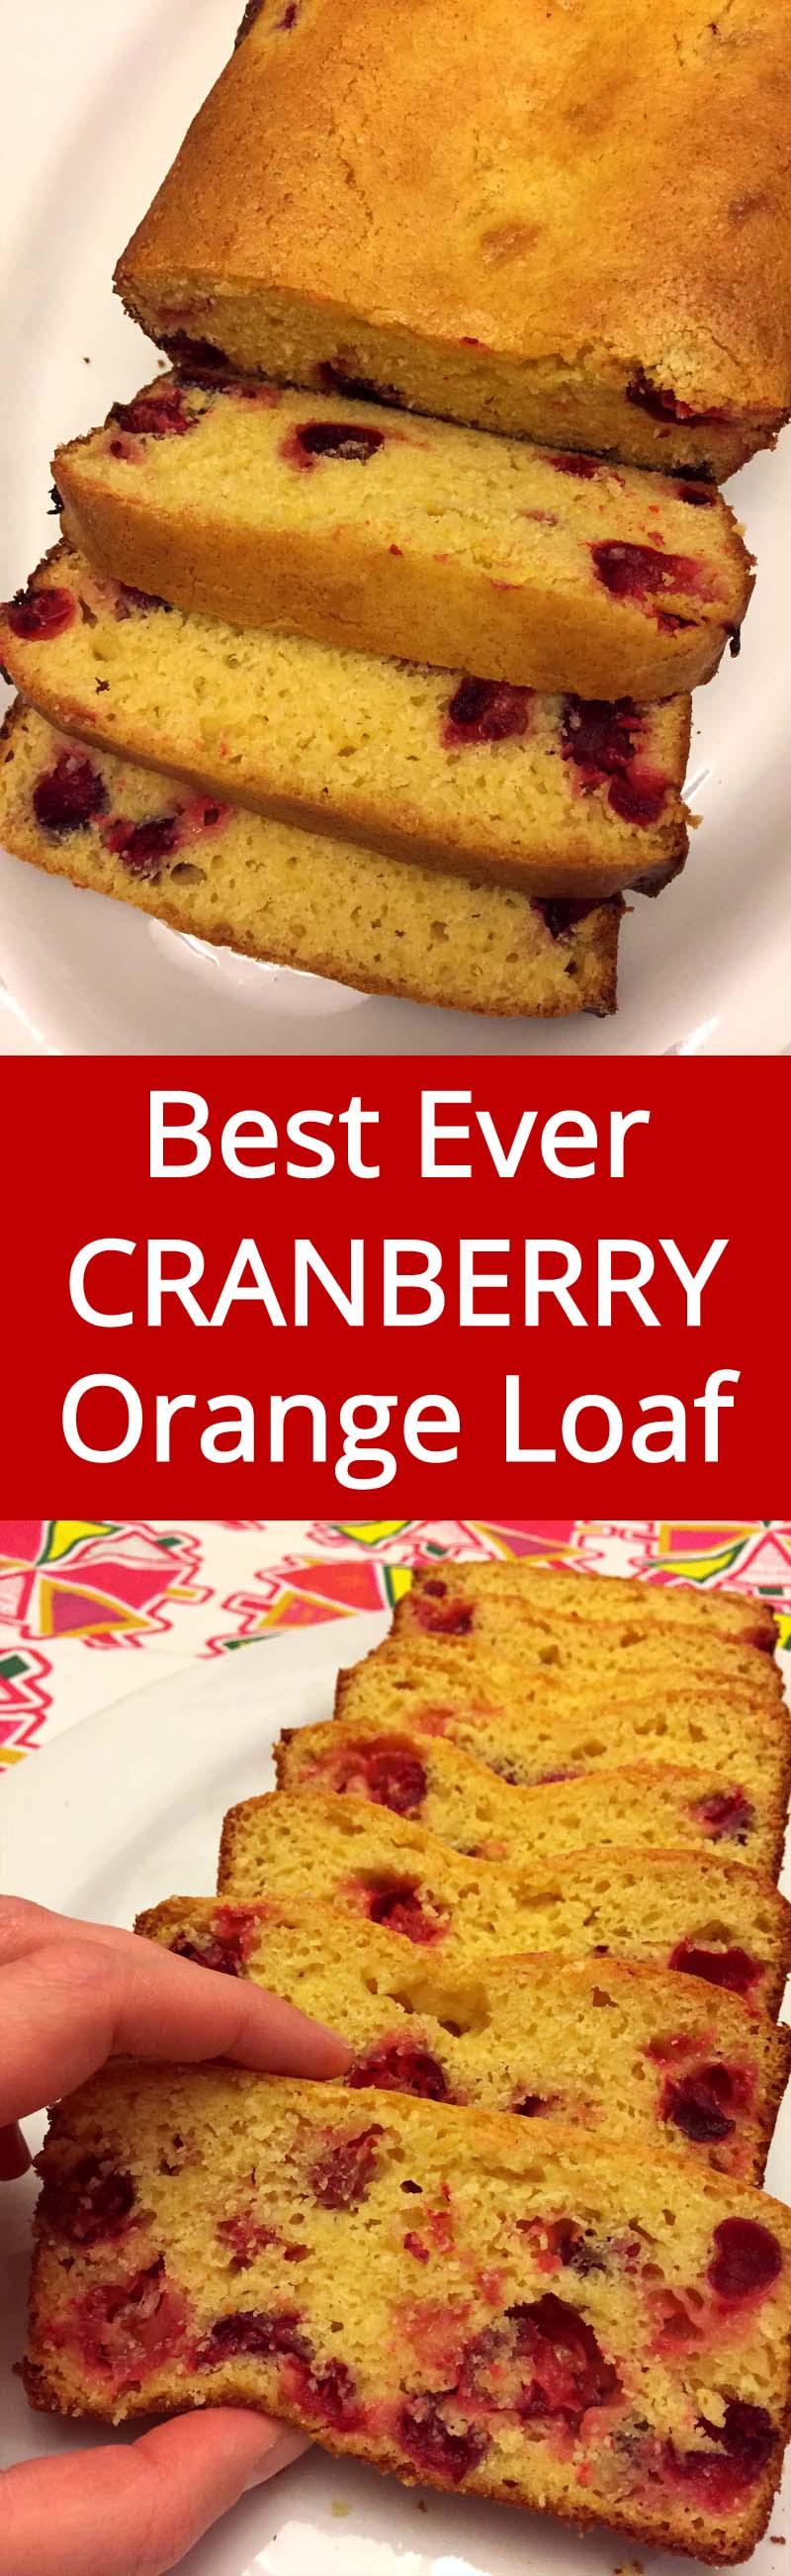 Cranberry Orange Bread - best recipe I ever tried!  Perfect for Christmas and any holiday!  MelanieCooks.com